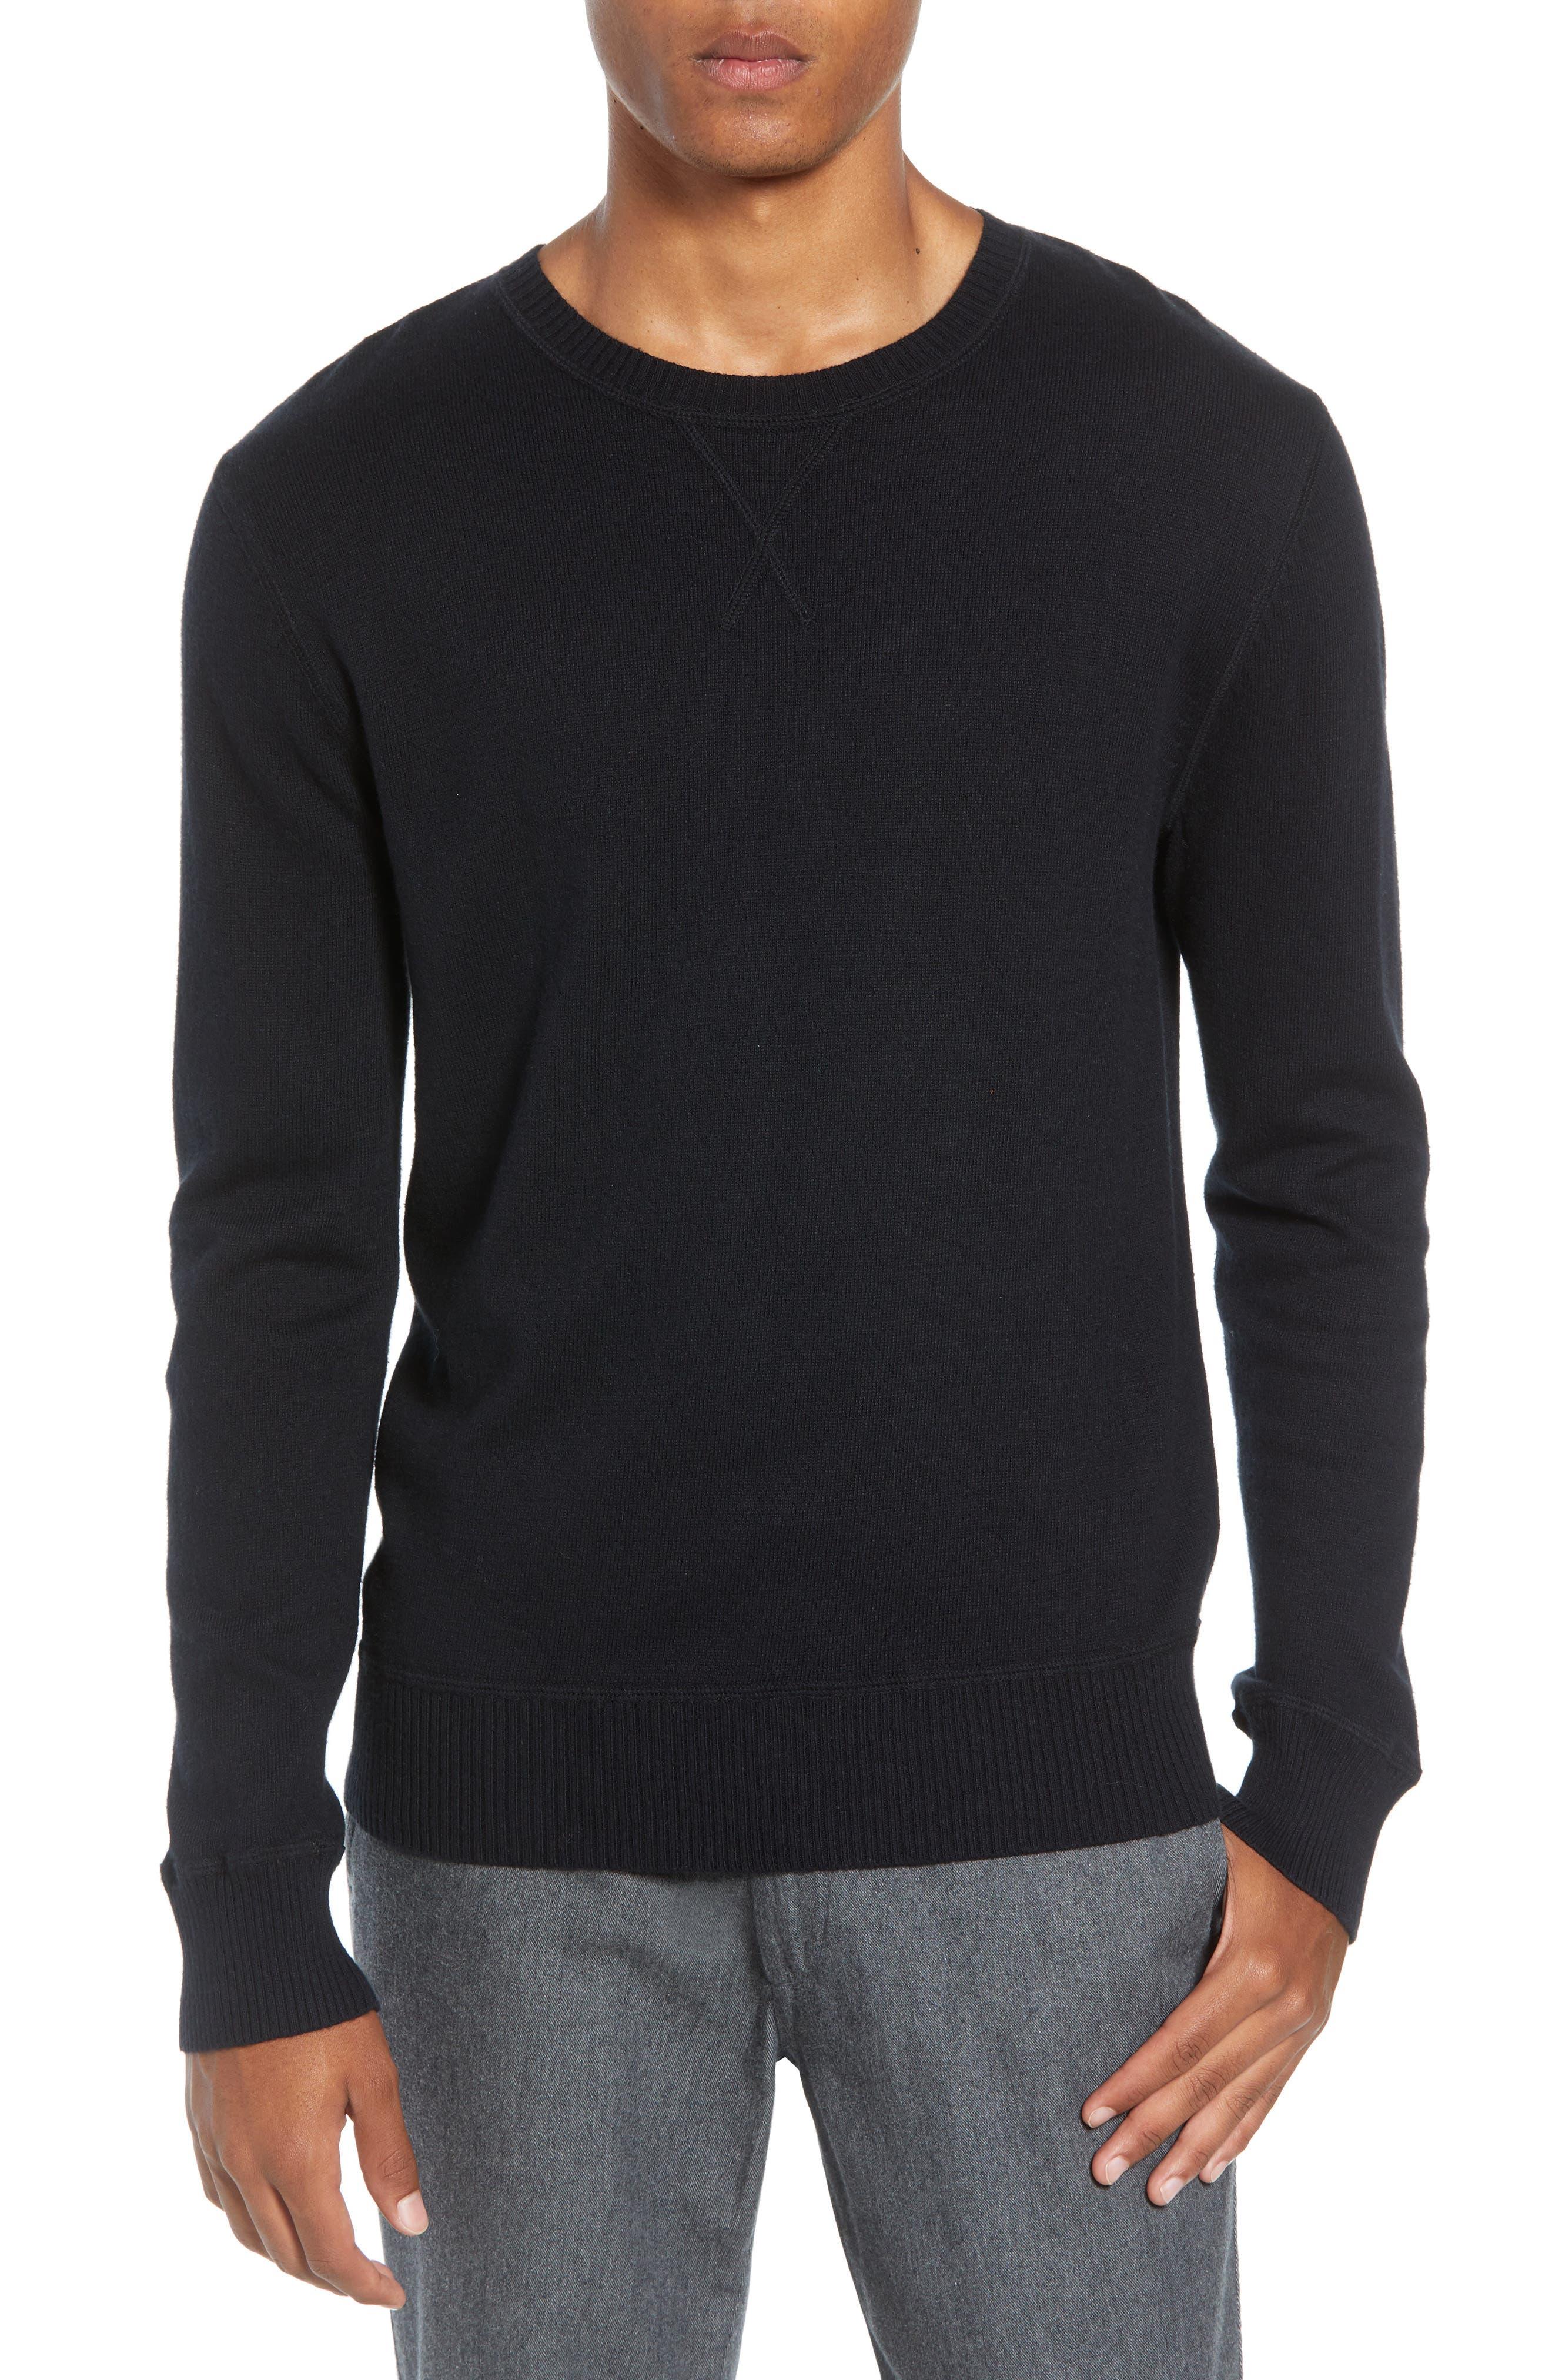 Tournament Slim Fit Crewneck Sweater,                         Main,                         color, BLACK